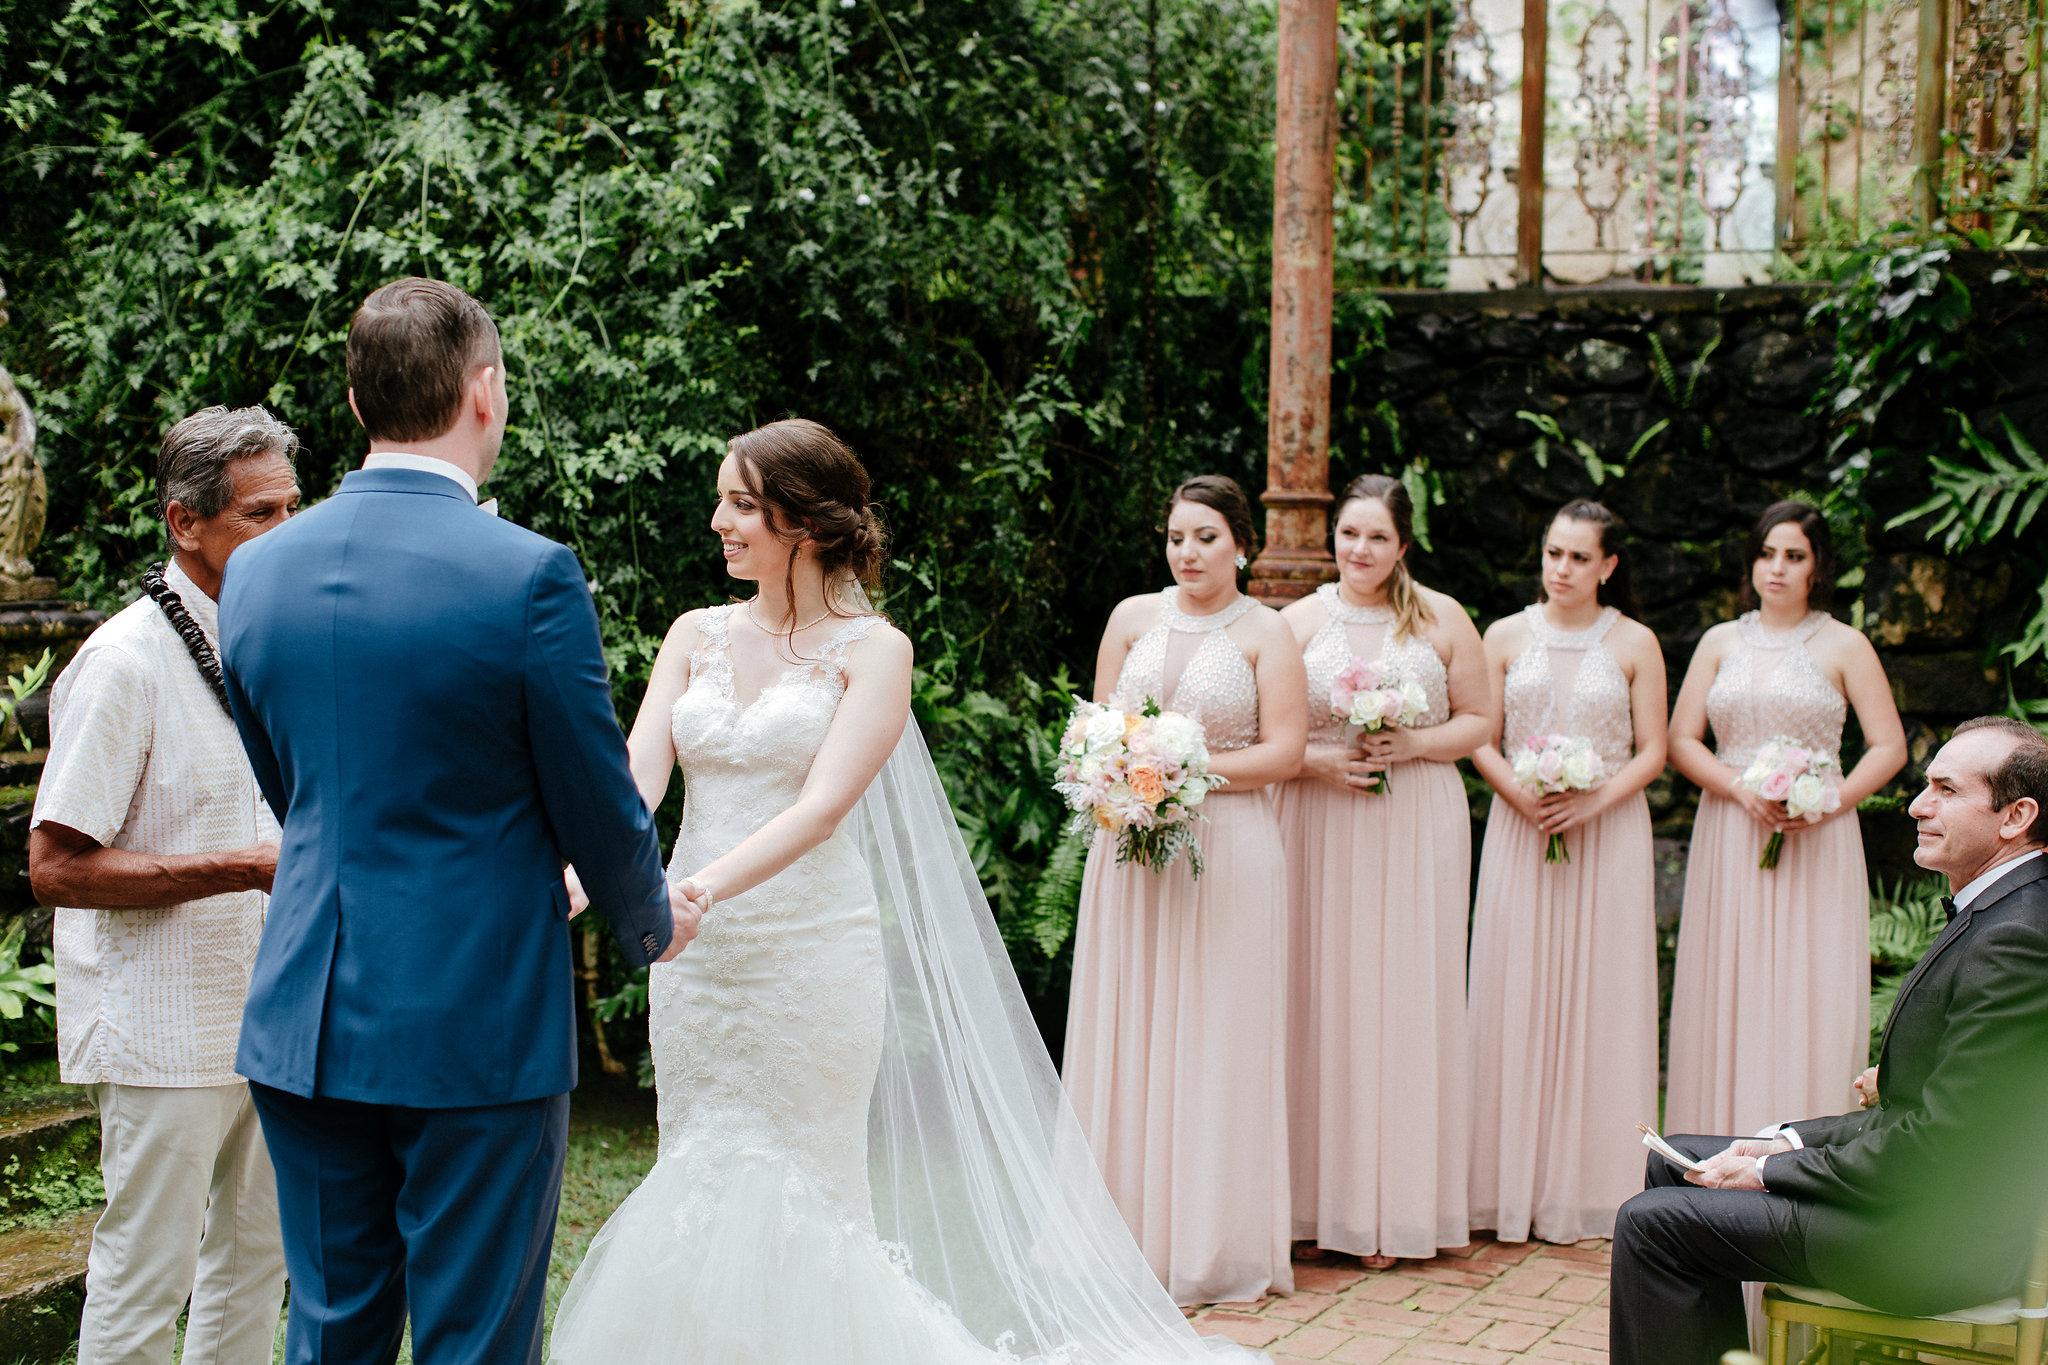 A Romantic Haiku Mill Maui Wedding - The Overwhelmed Bride Wedding Inspiration Ideas Blog